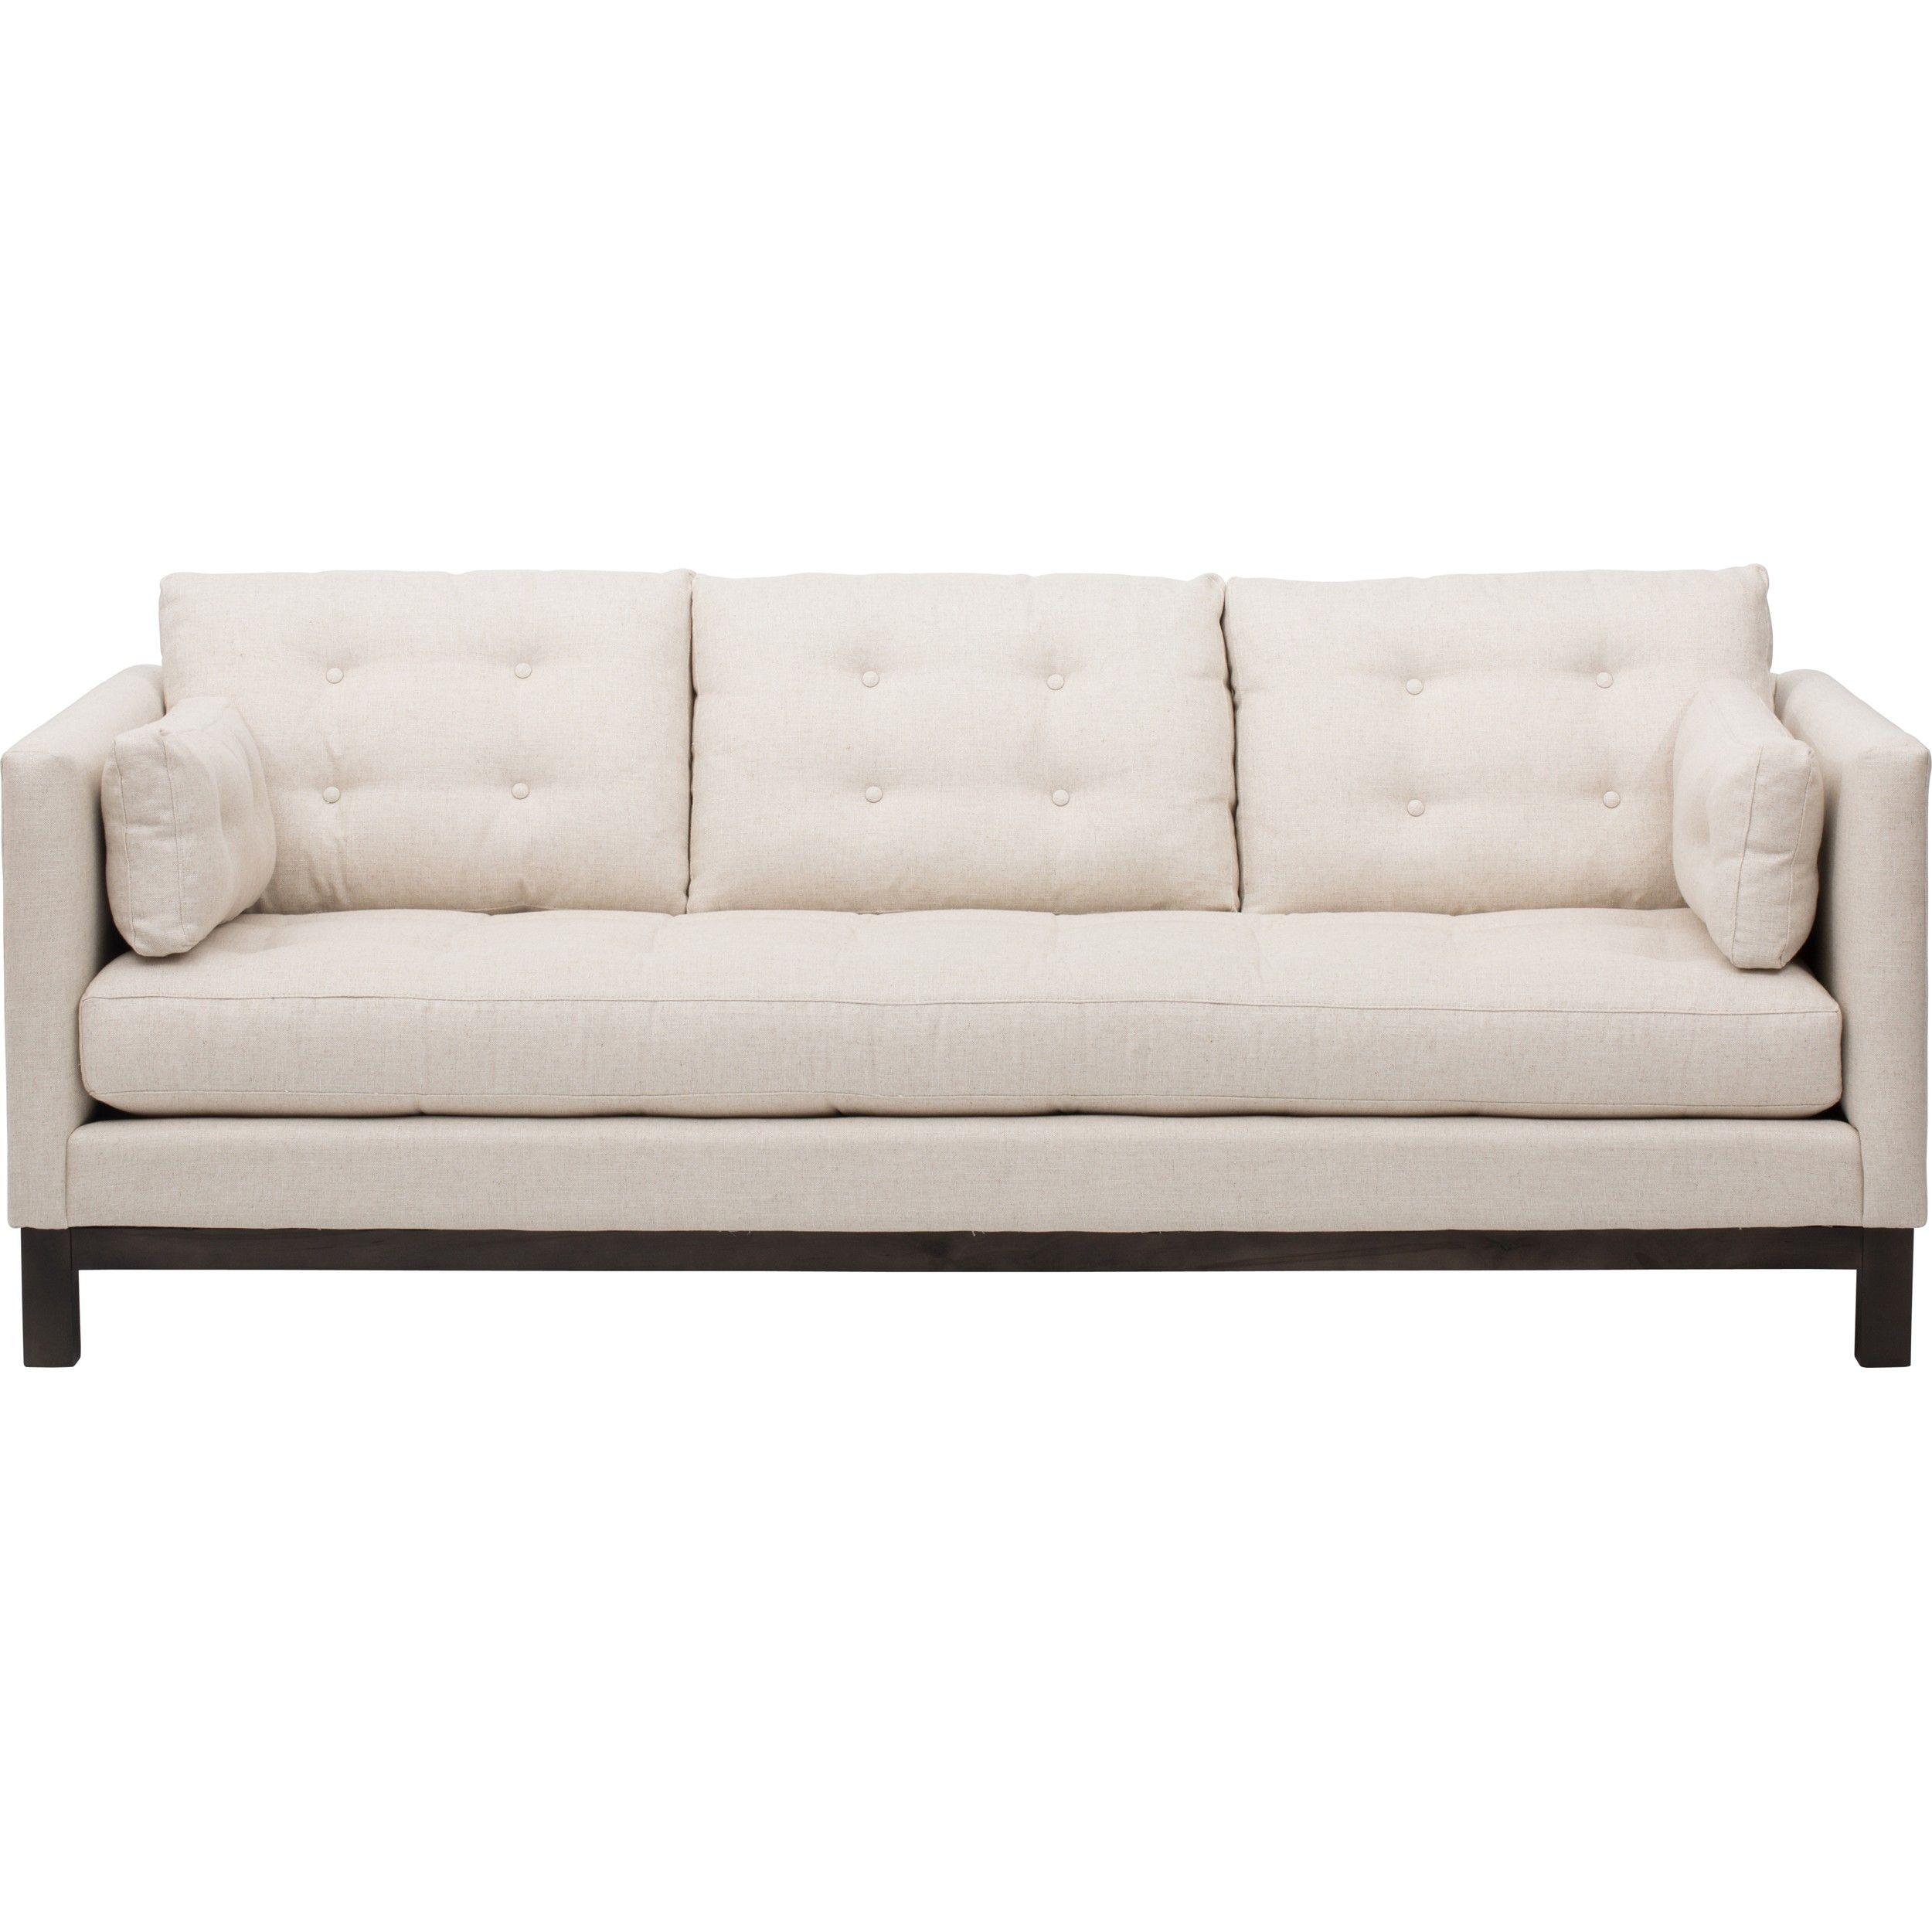 Cream Sectional Sofa Fabric Dimensions Savona Queen Sleeper Kent Crevere Sara Hughes